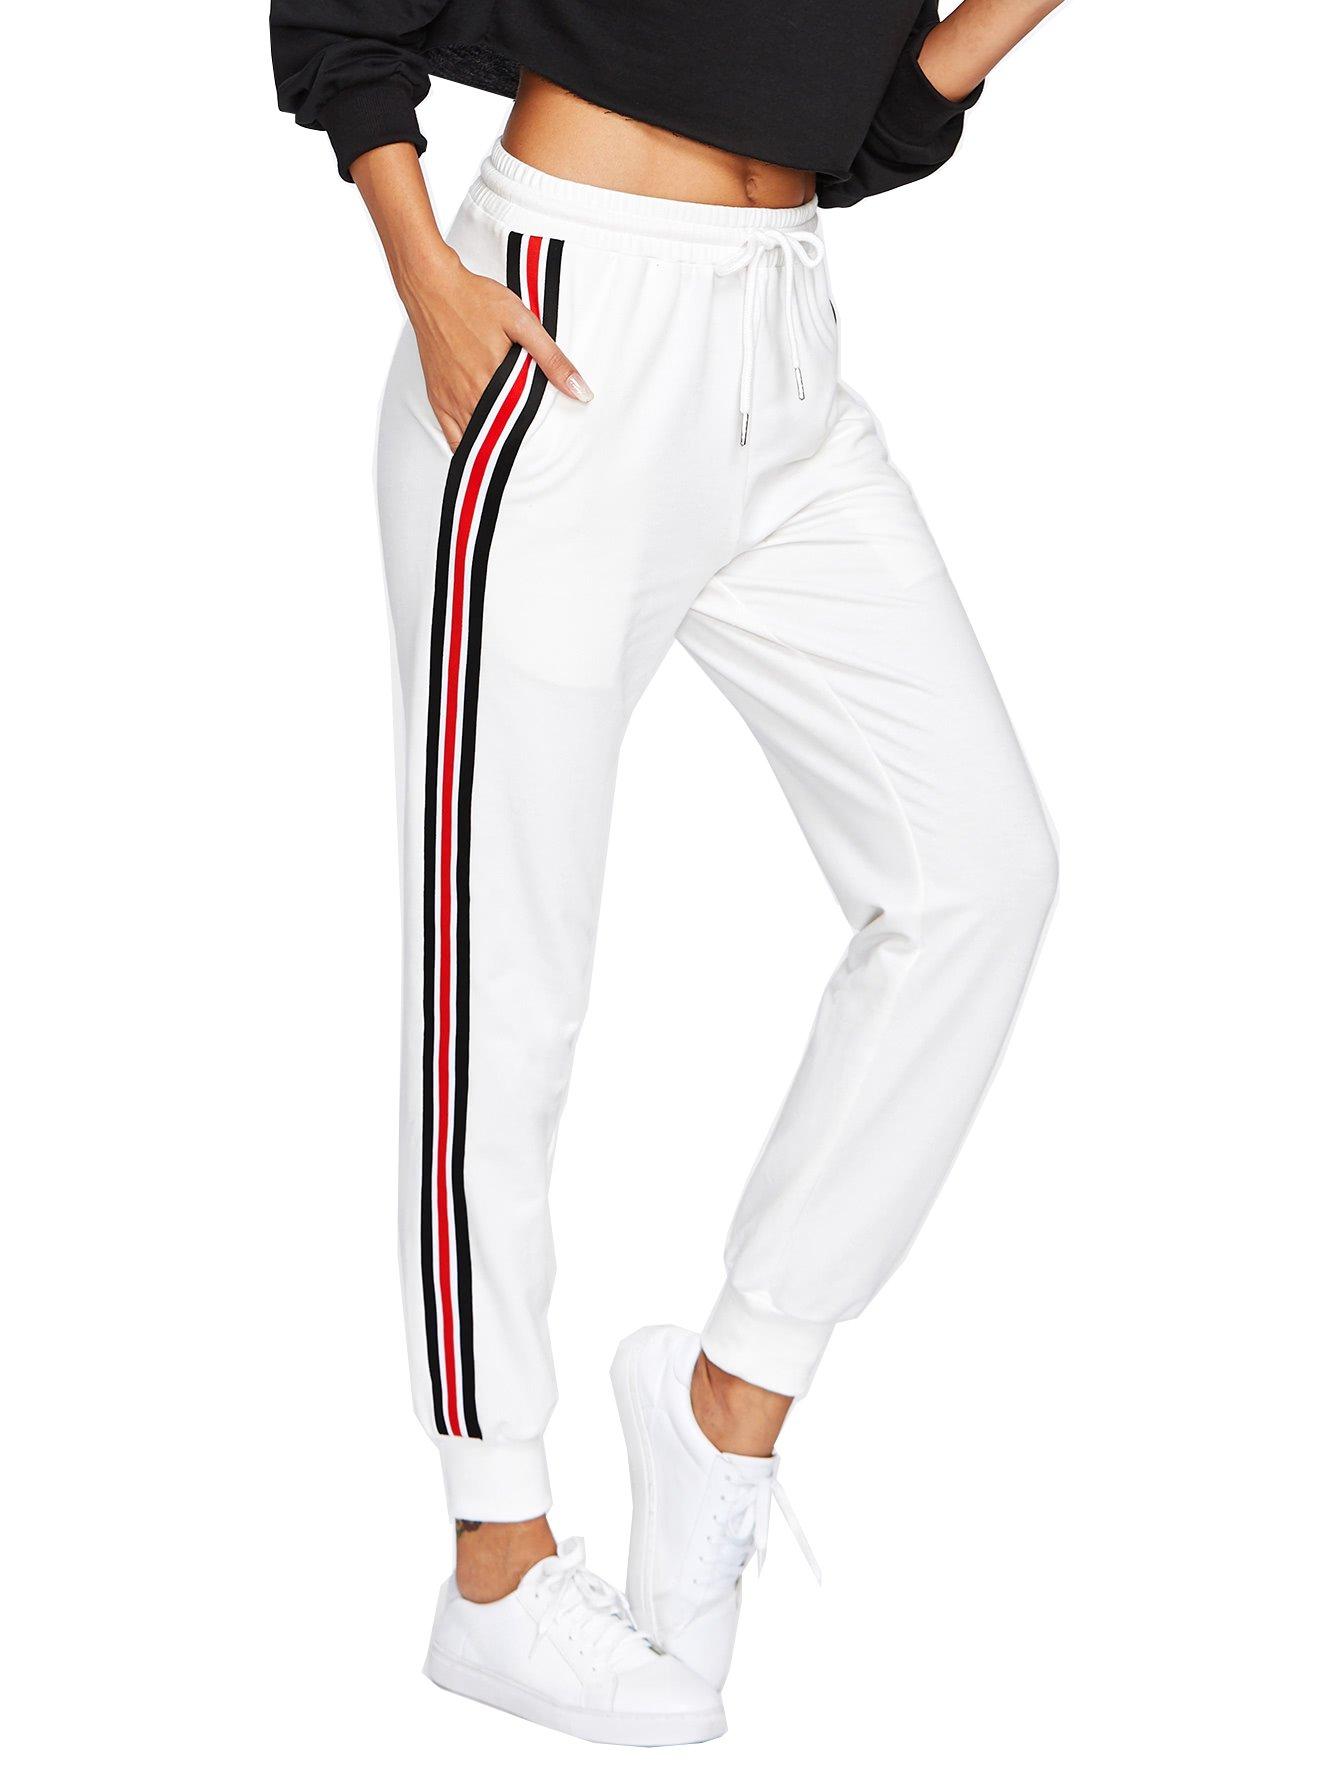 SweatyRocks Women's Drawstring Waist Striped Side Jogger Sweatpants with Pockets (Medium, White)